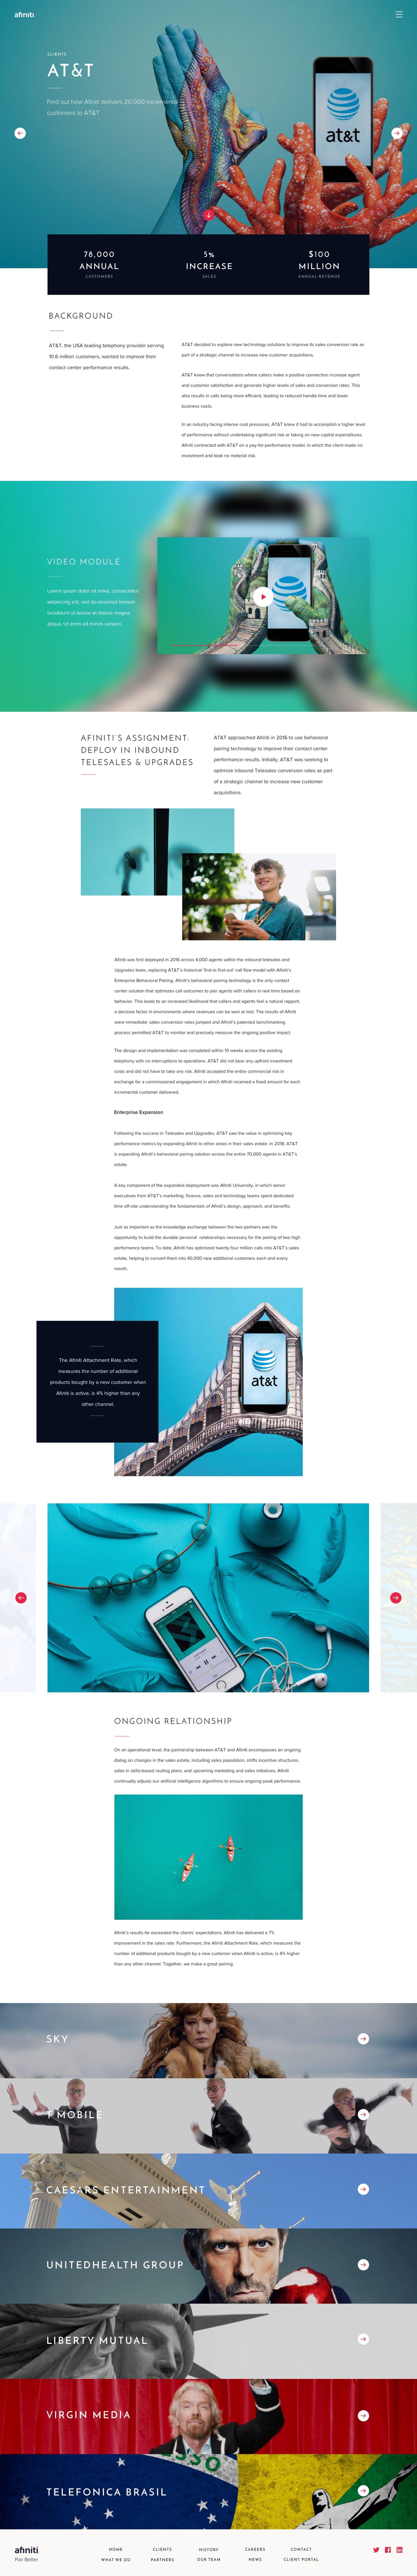 Pin By Edward Perez On Web Design Corporate Website Design Layout Design Web Design Inspiration